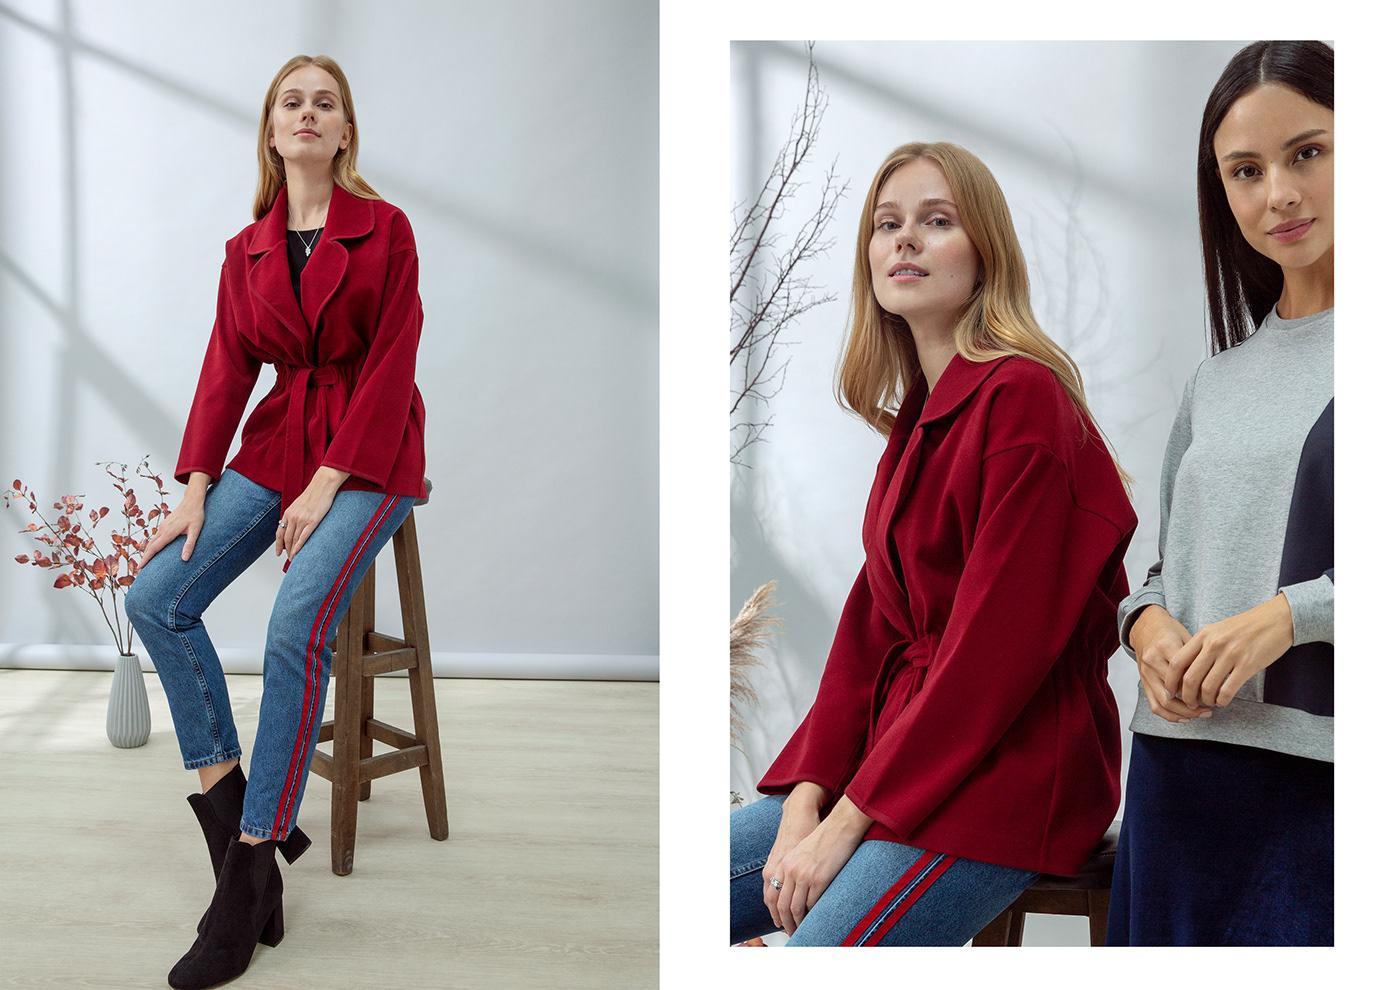 tchibo katalog moda Fashion  editorial 85/90 projects burcumbaygut burcum baygut